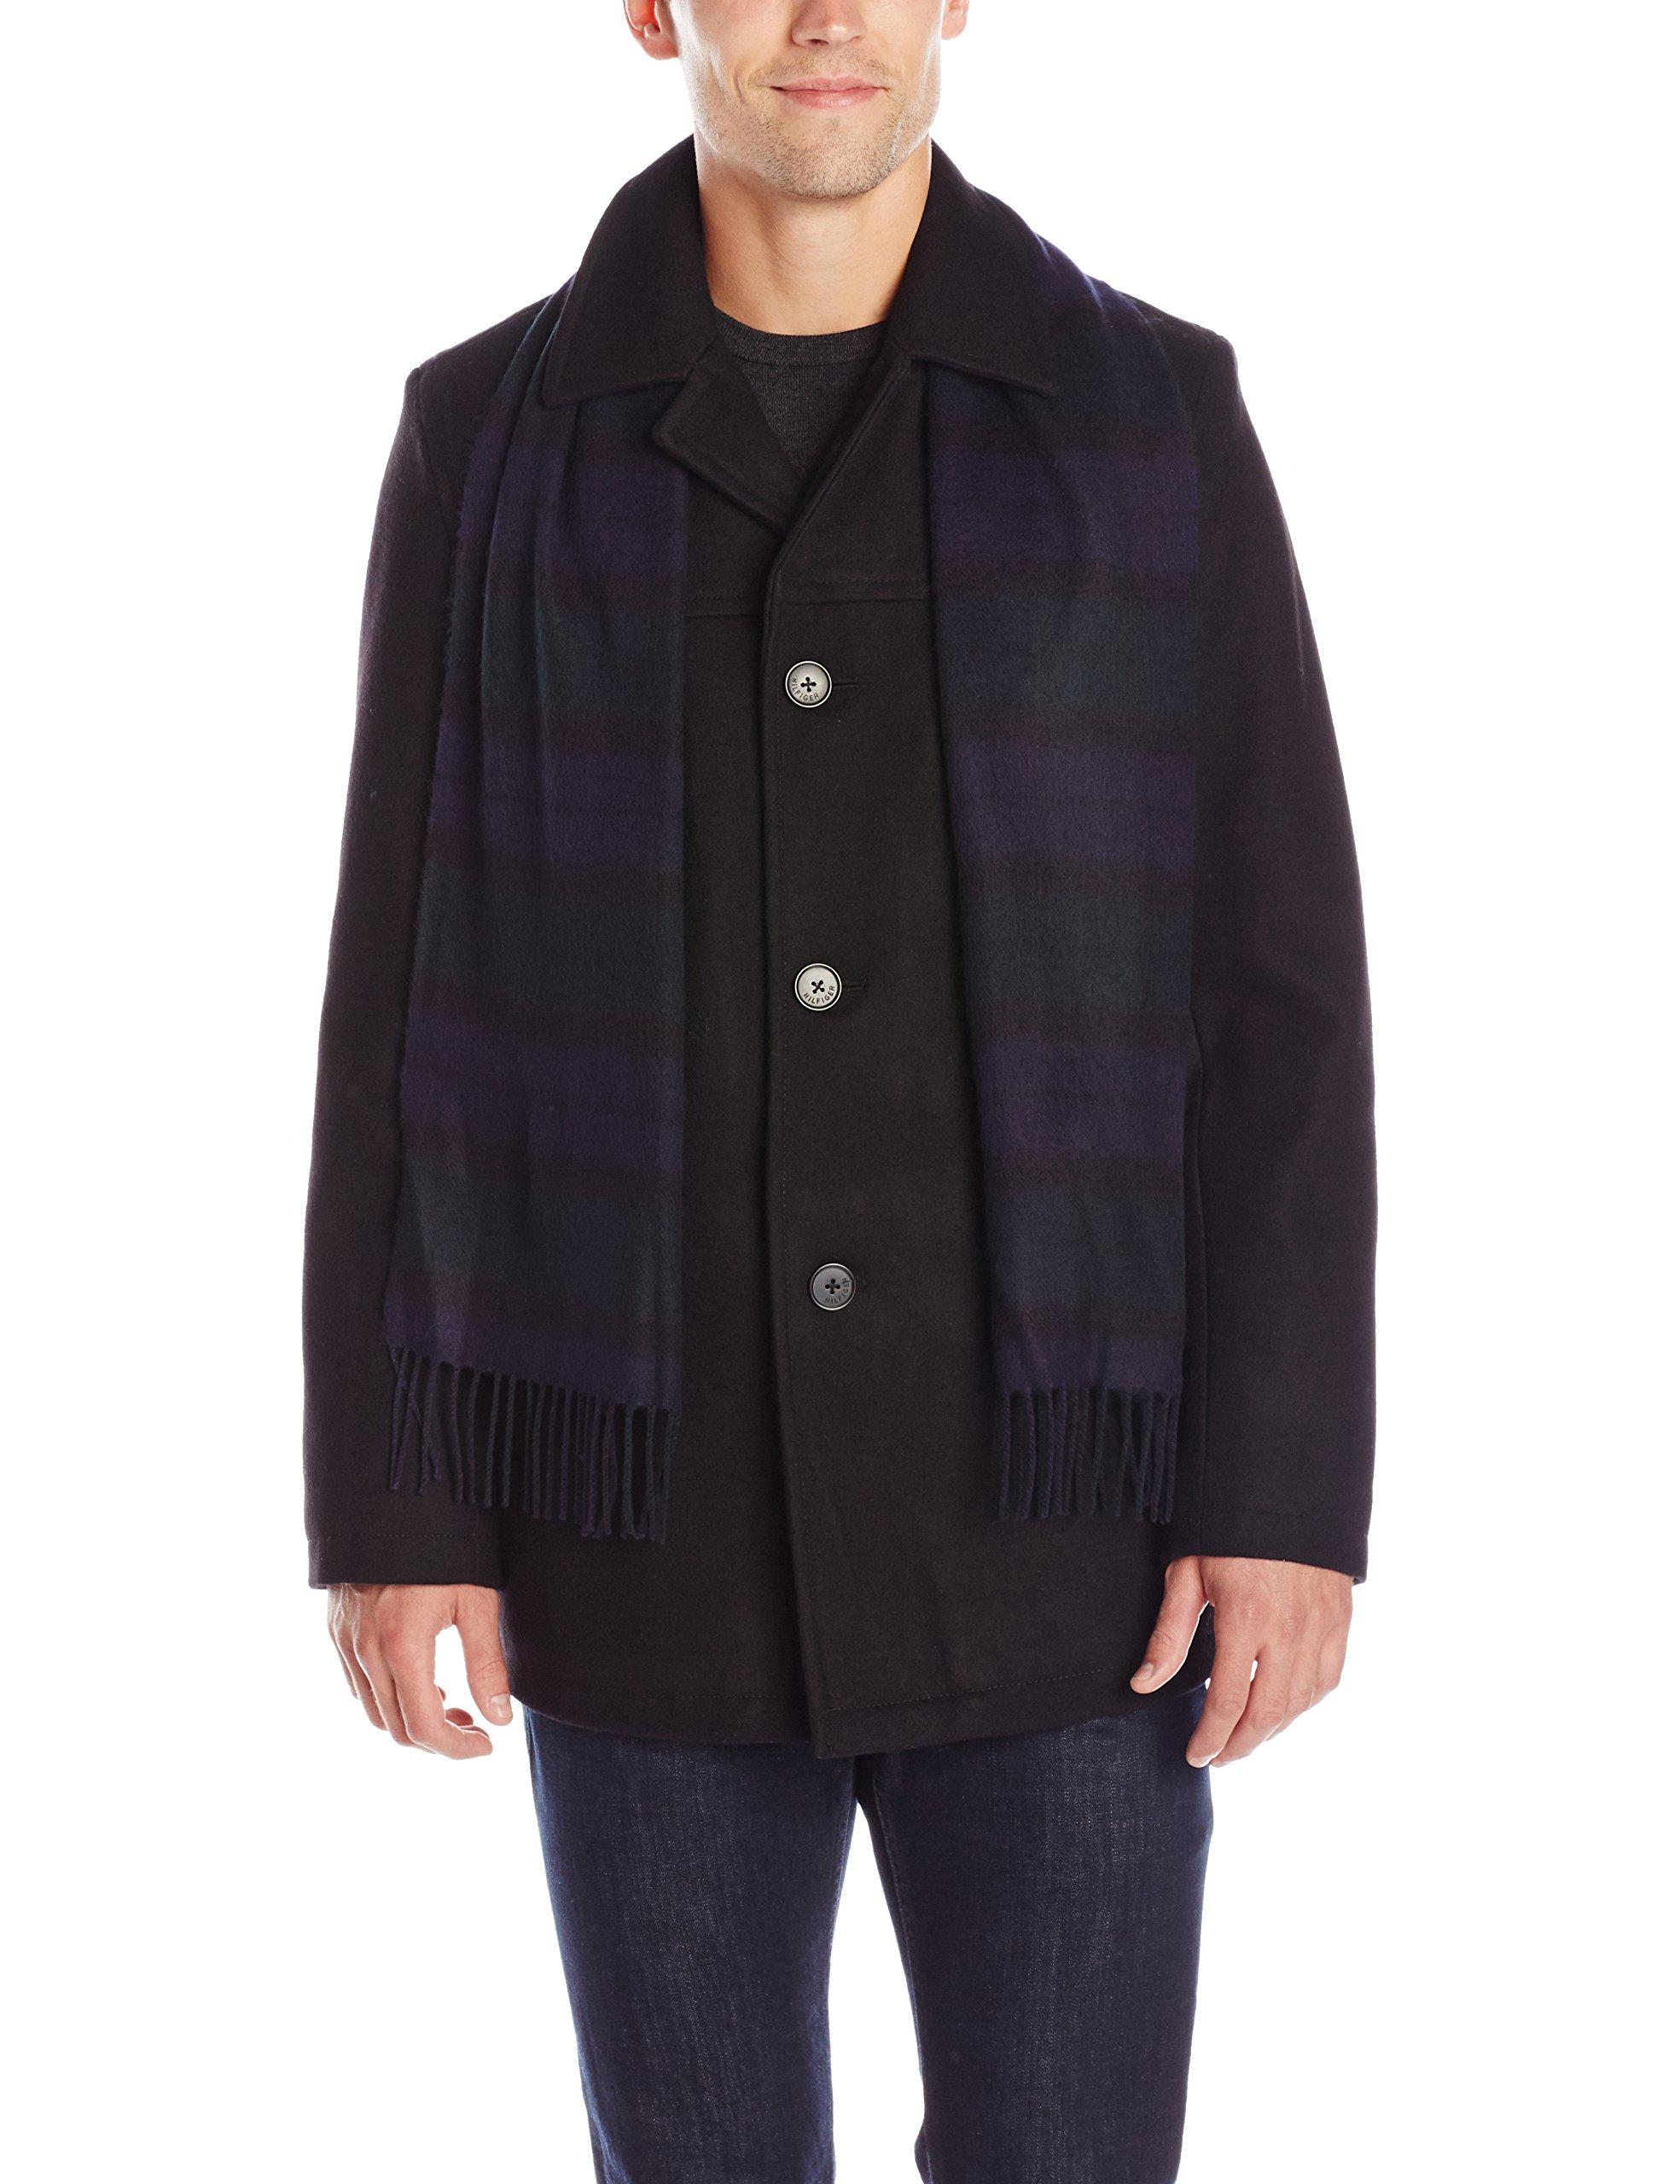 Tommy Hilfiger Men's Wool Melton Walking Coat with Detachable Scarf, Black, Medium by Tommy Hilfiger (Image #1)